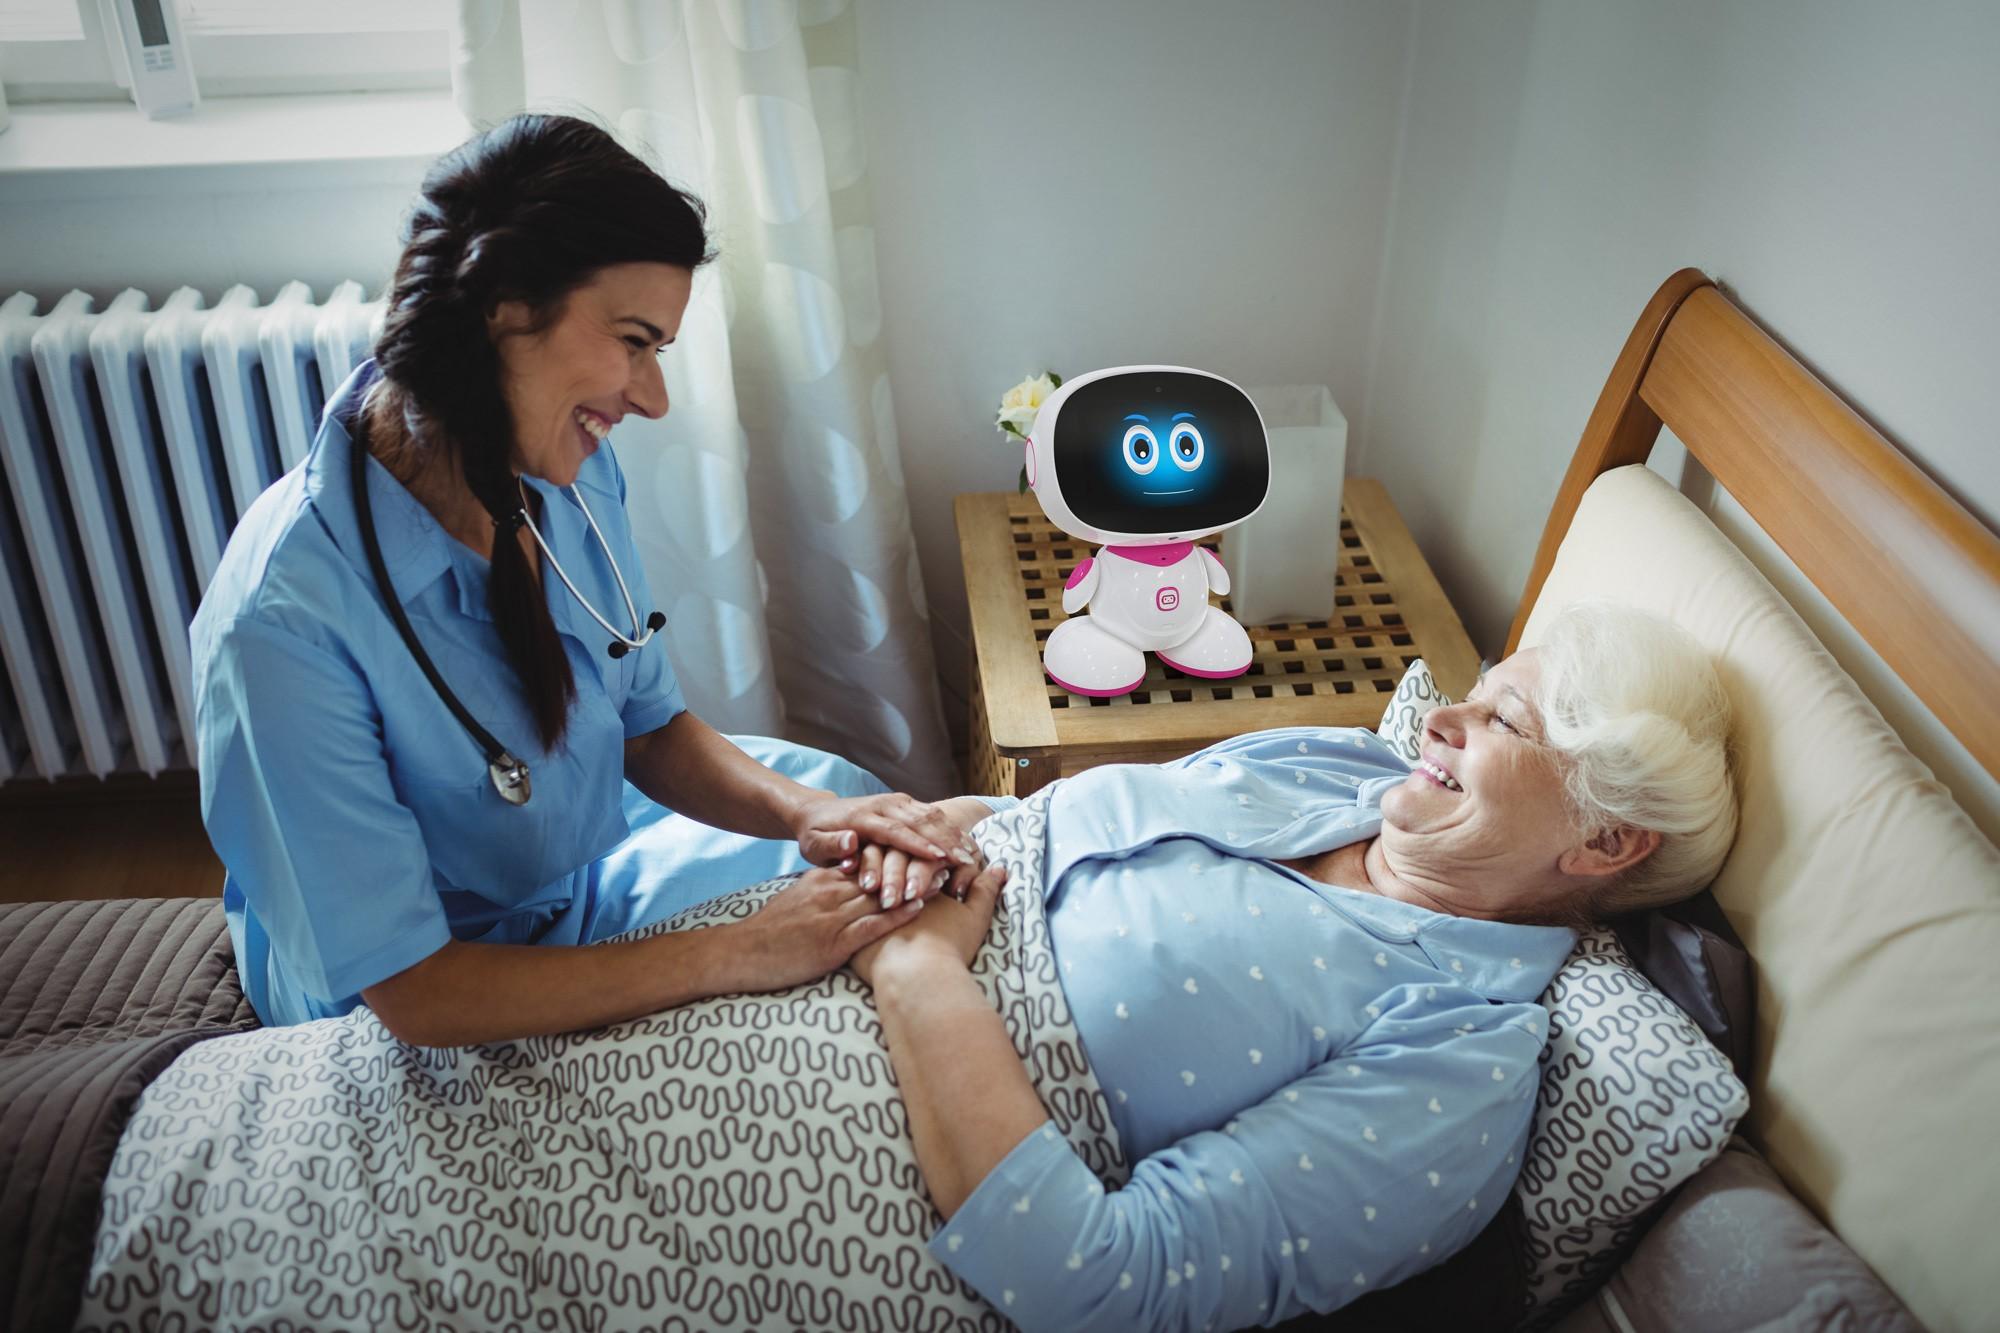 companion robots for the elderly